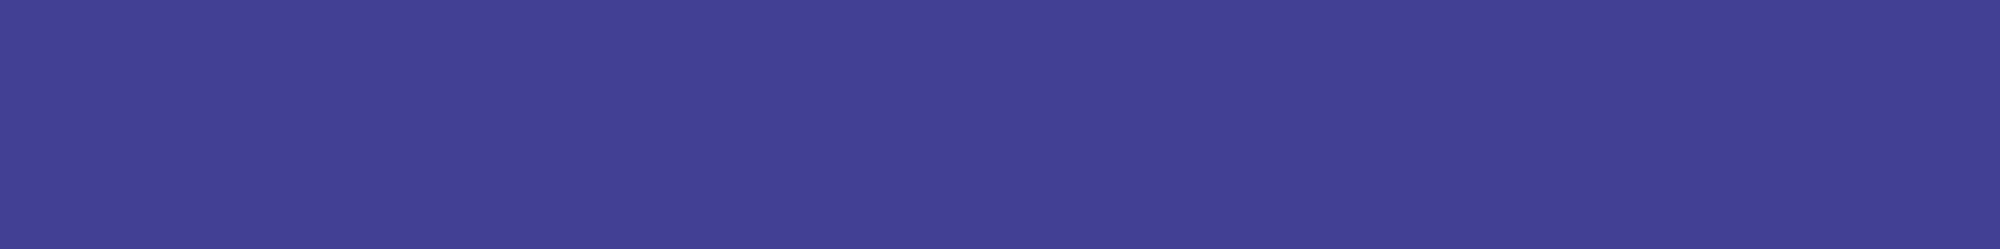 wave-bottom-purple-transparent